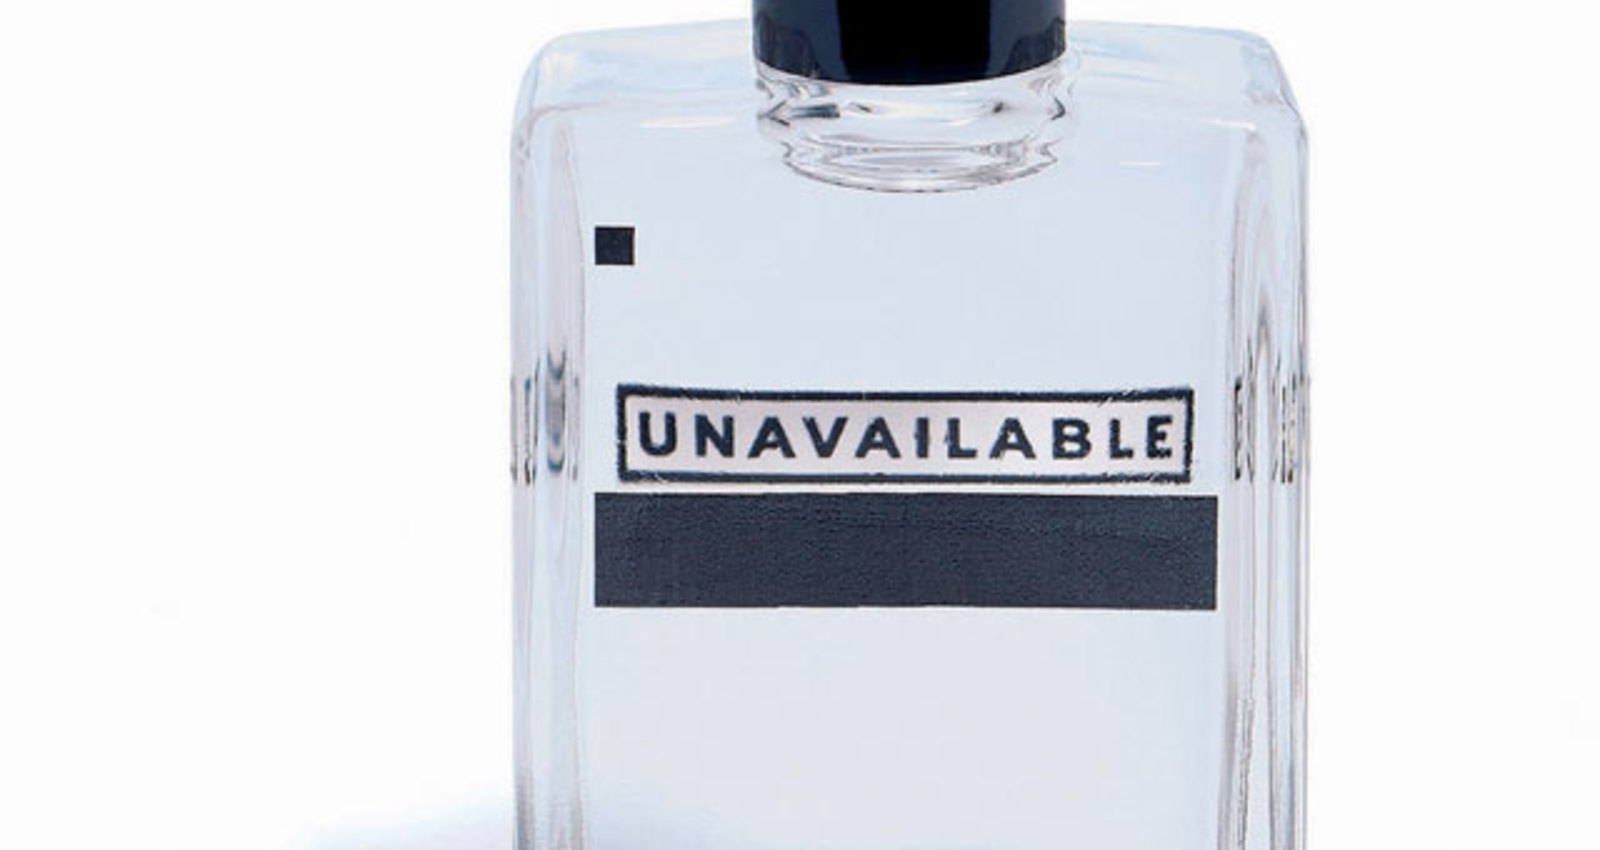 Unavailable Perfume